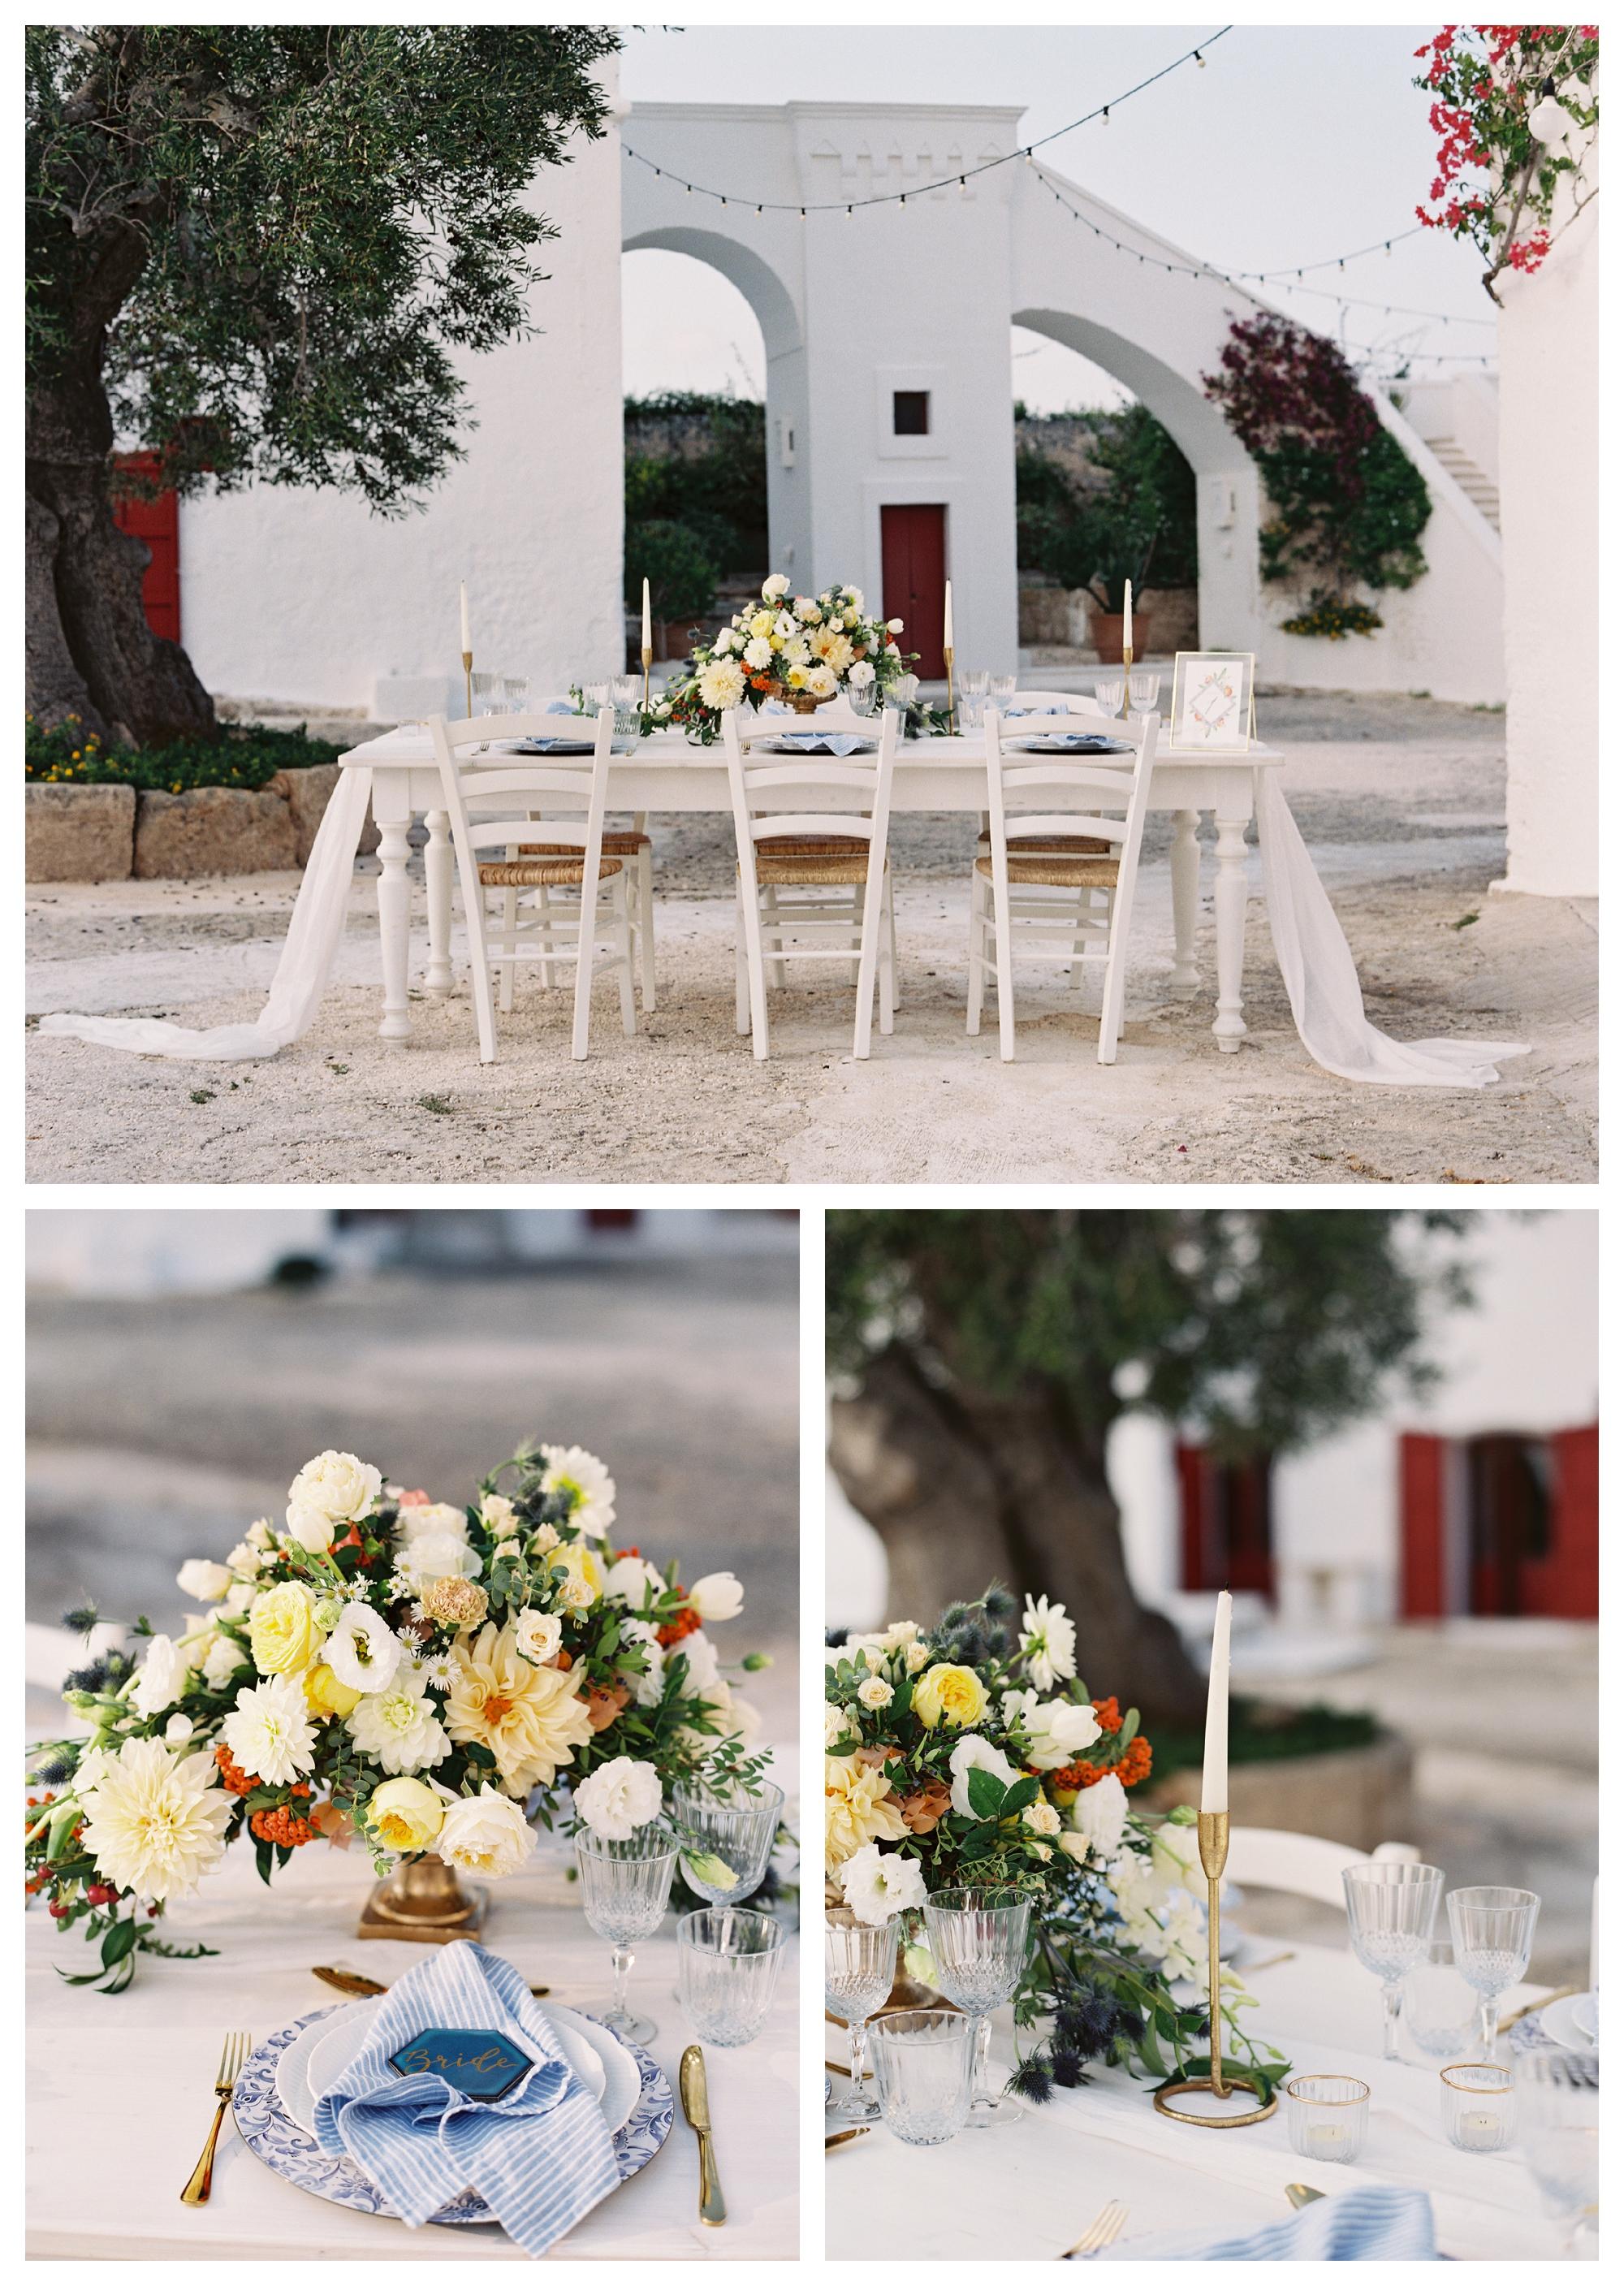 italy wedding, wedding table, destination wedding puglia, al fresco wedding, outdoor wedding, wedding centerpiece, yellow flowers, summer wedding,